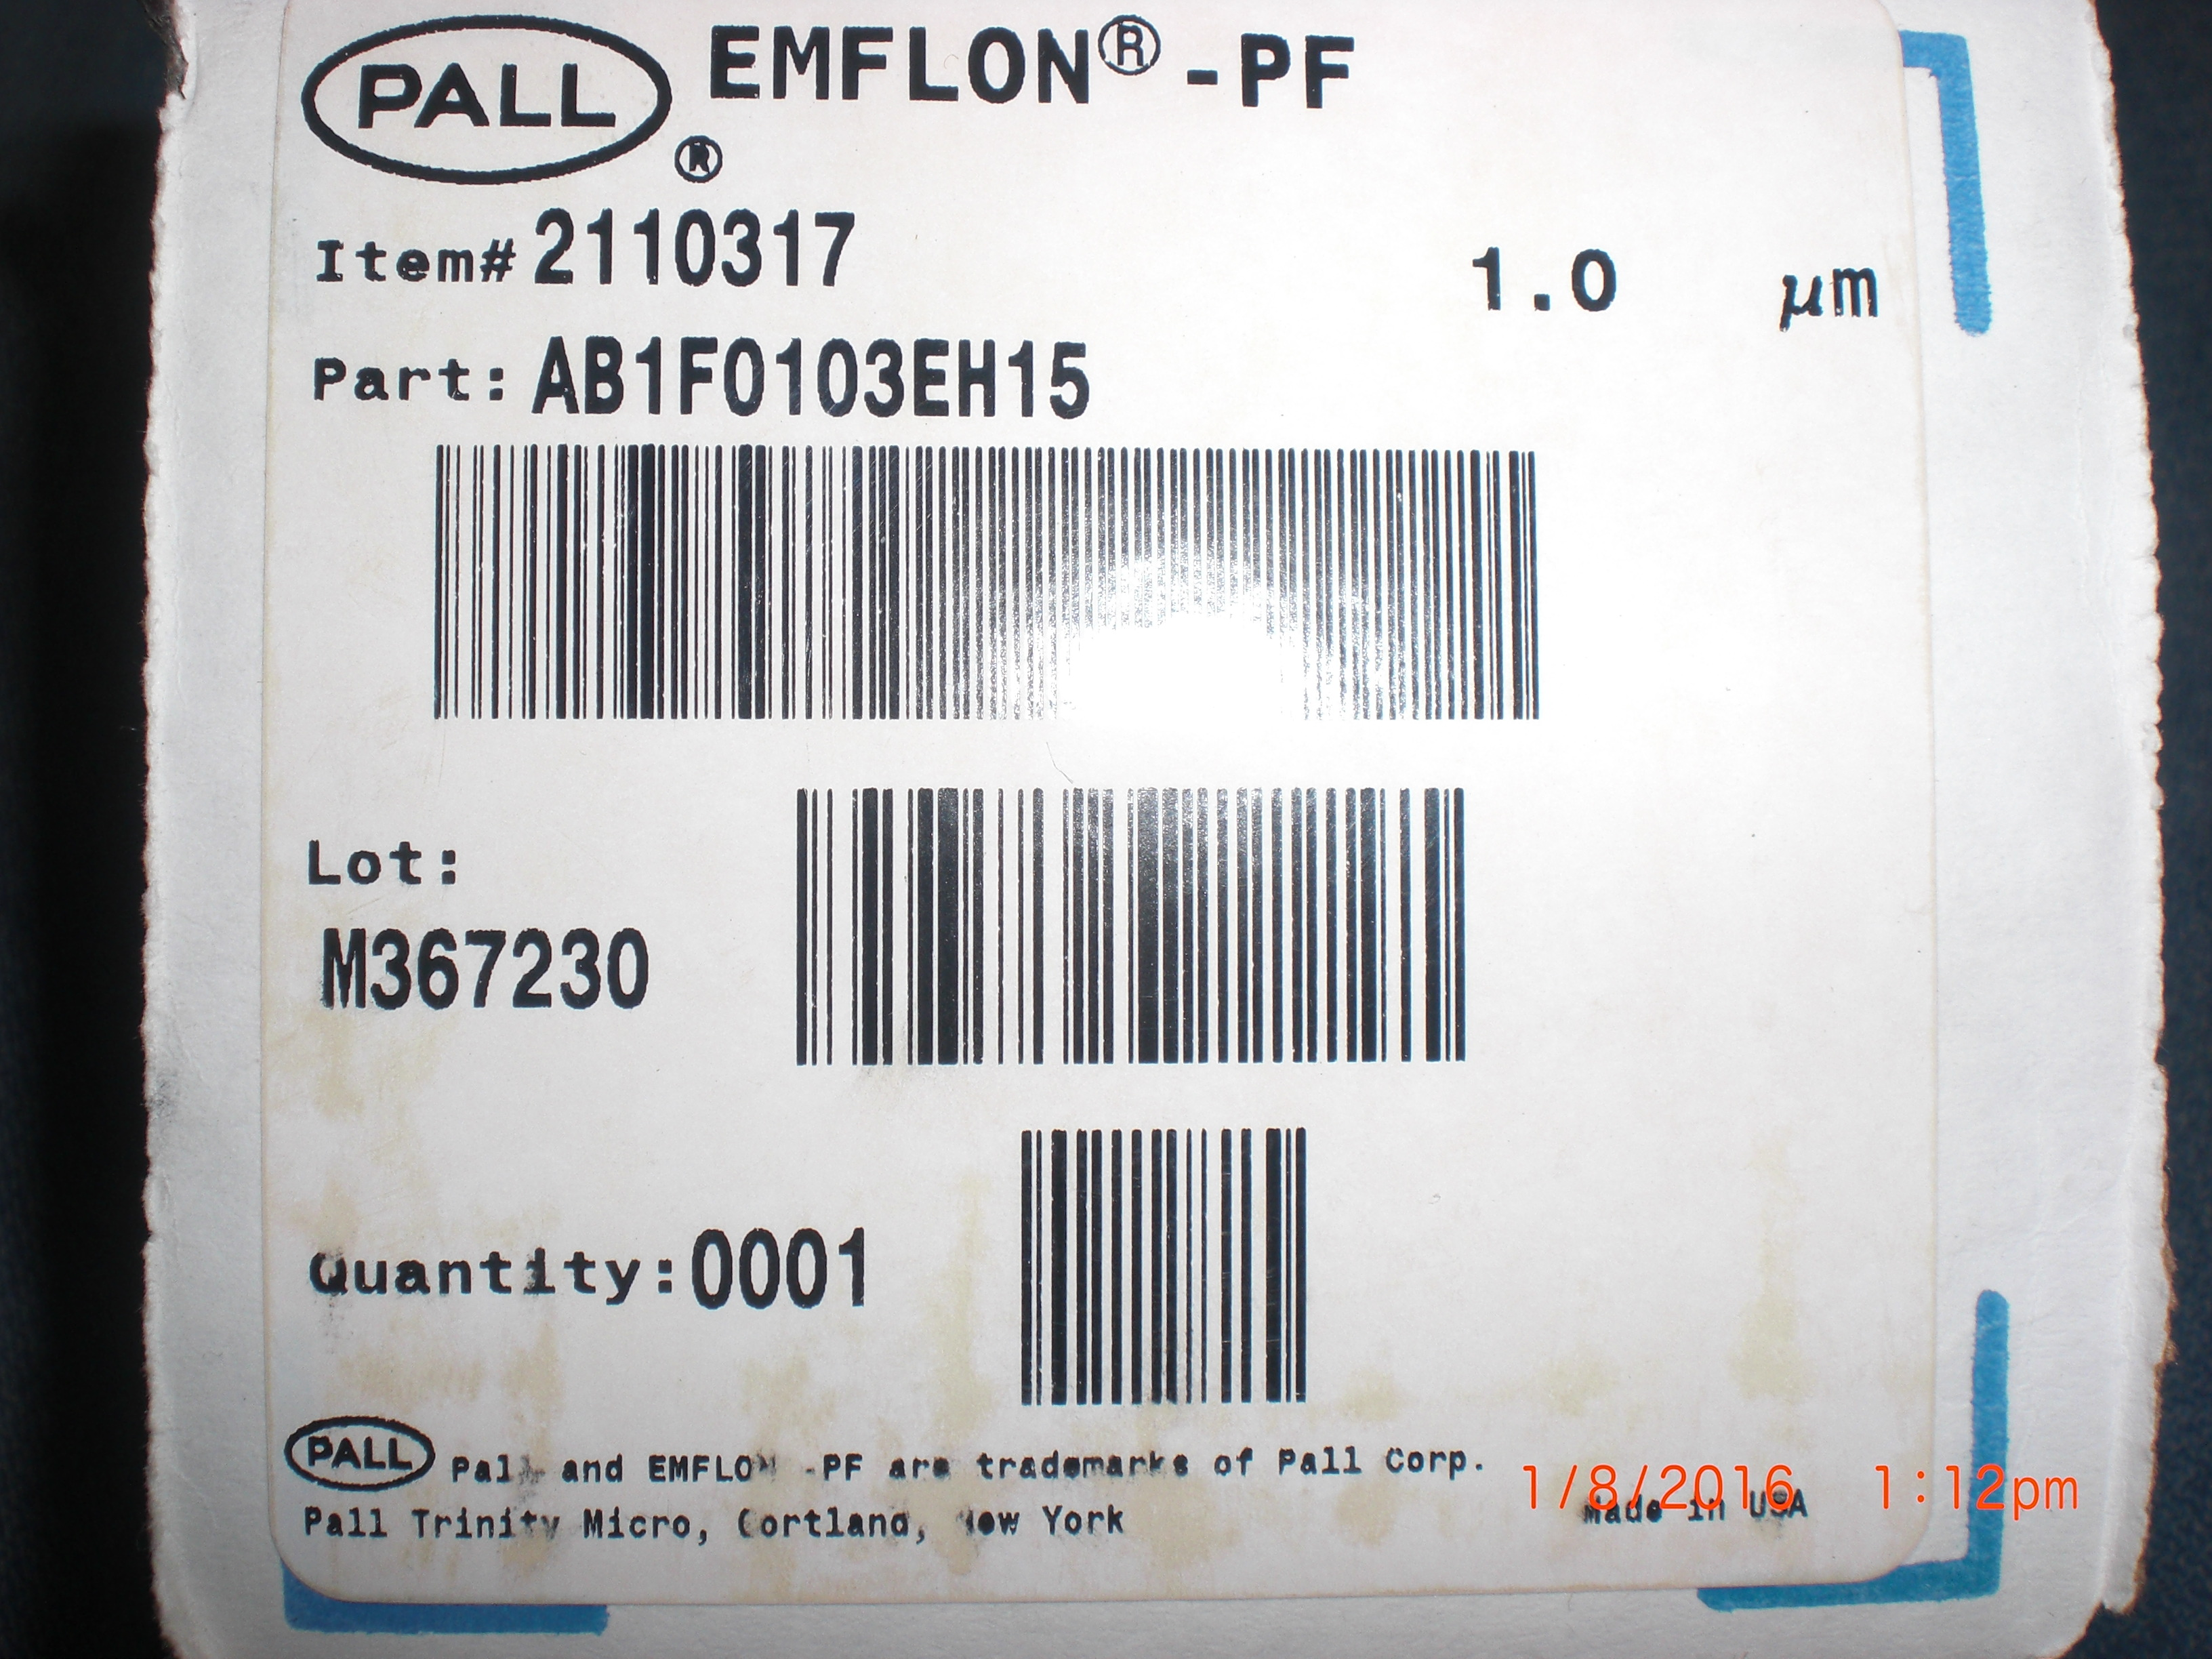 Filter  Emflon PF 1.0um  10in  PALL AB1F0103EH15